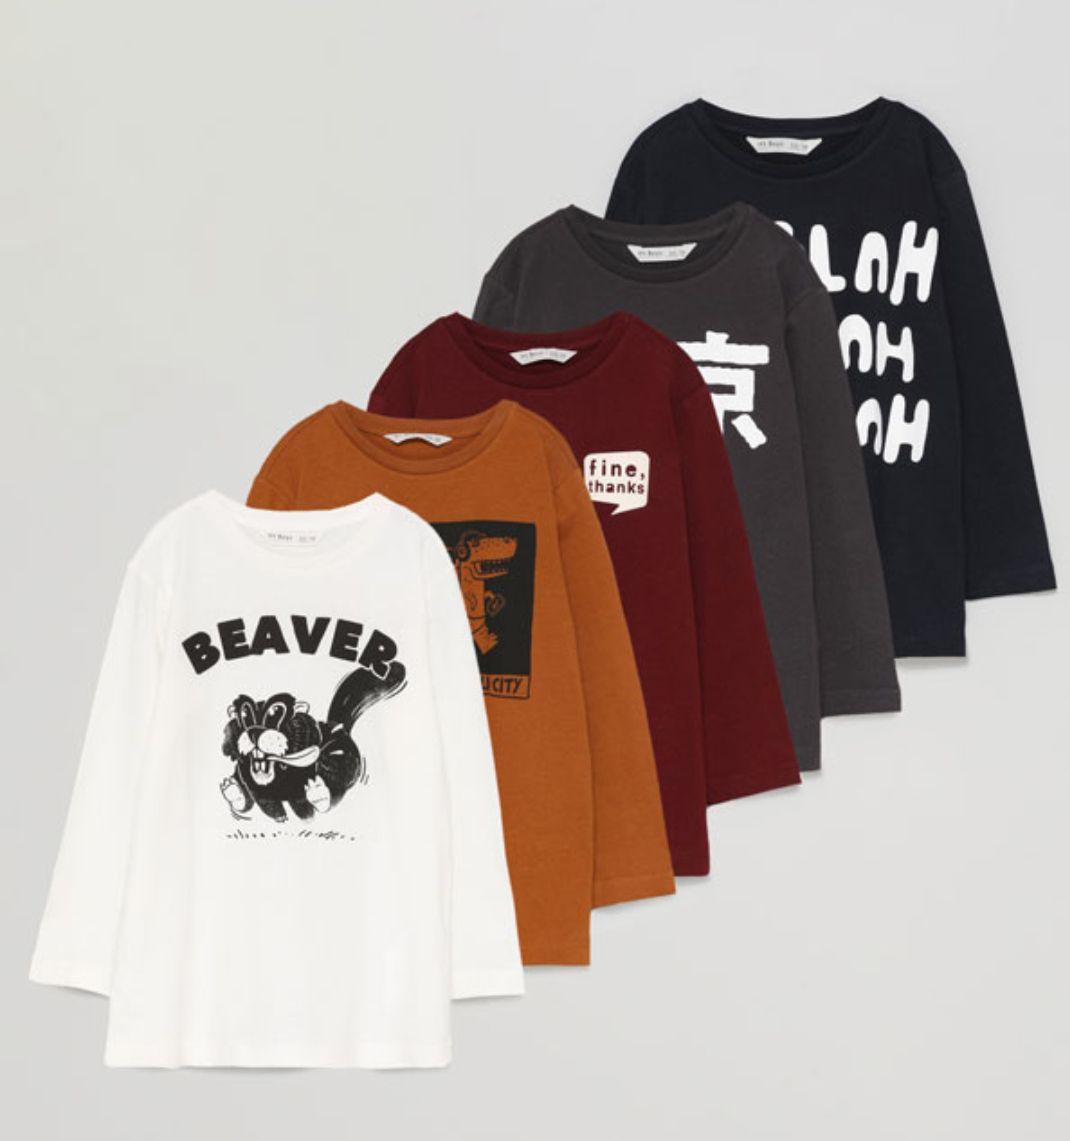 Pack 5 camisetas manga larga infantil. Todas las tallas. Envío gratis a tienda